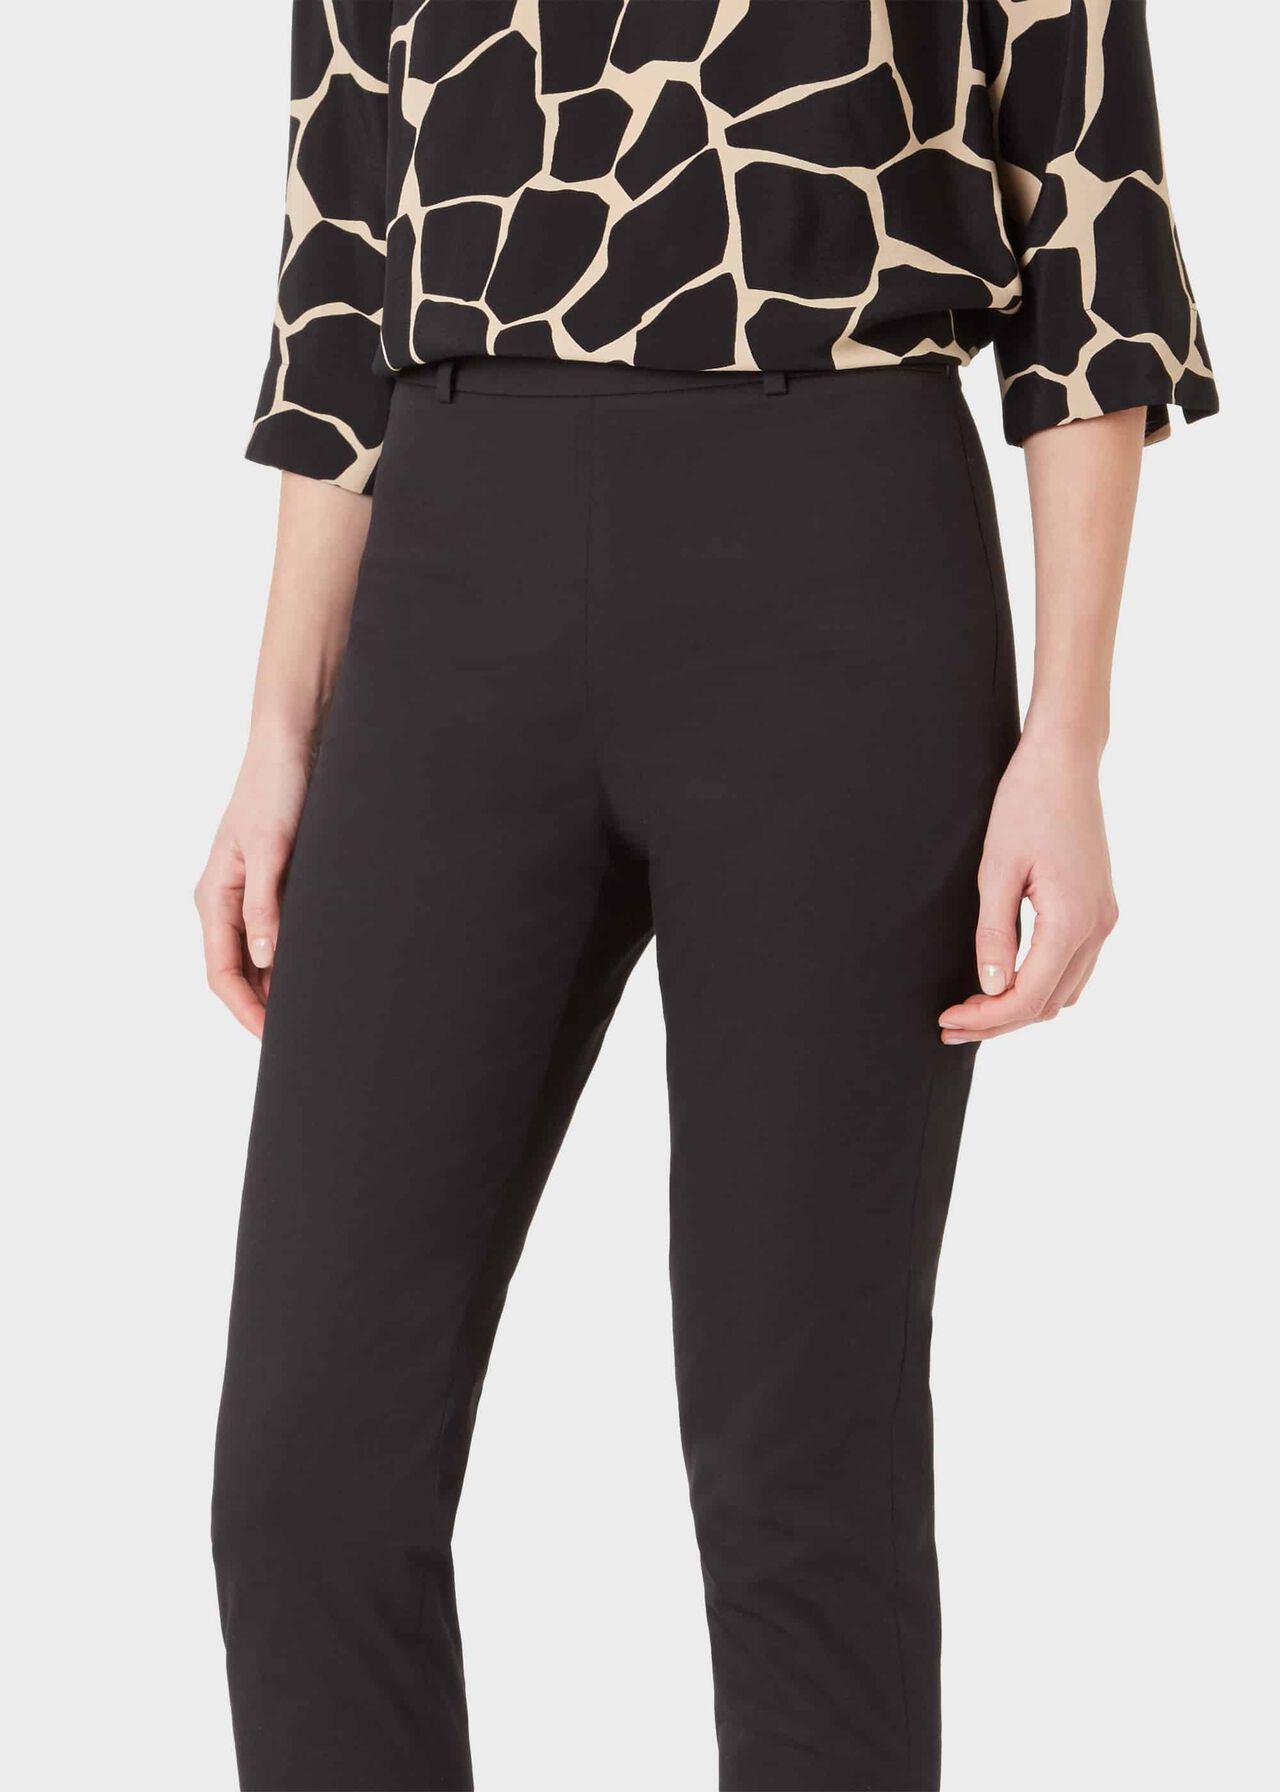 Mallory Cotton Blend Capri Trousers With Stretch, Black, hi-res